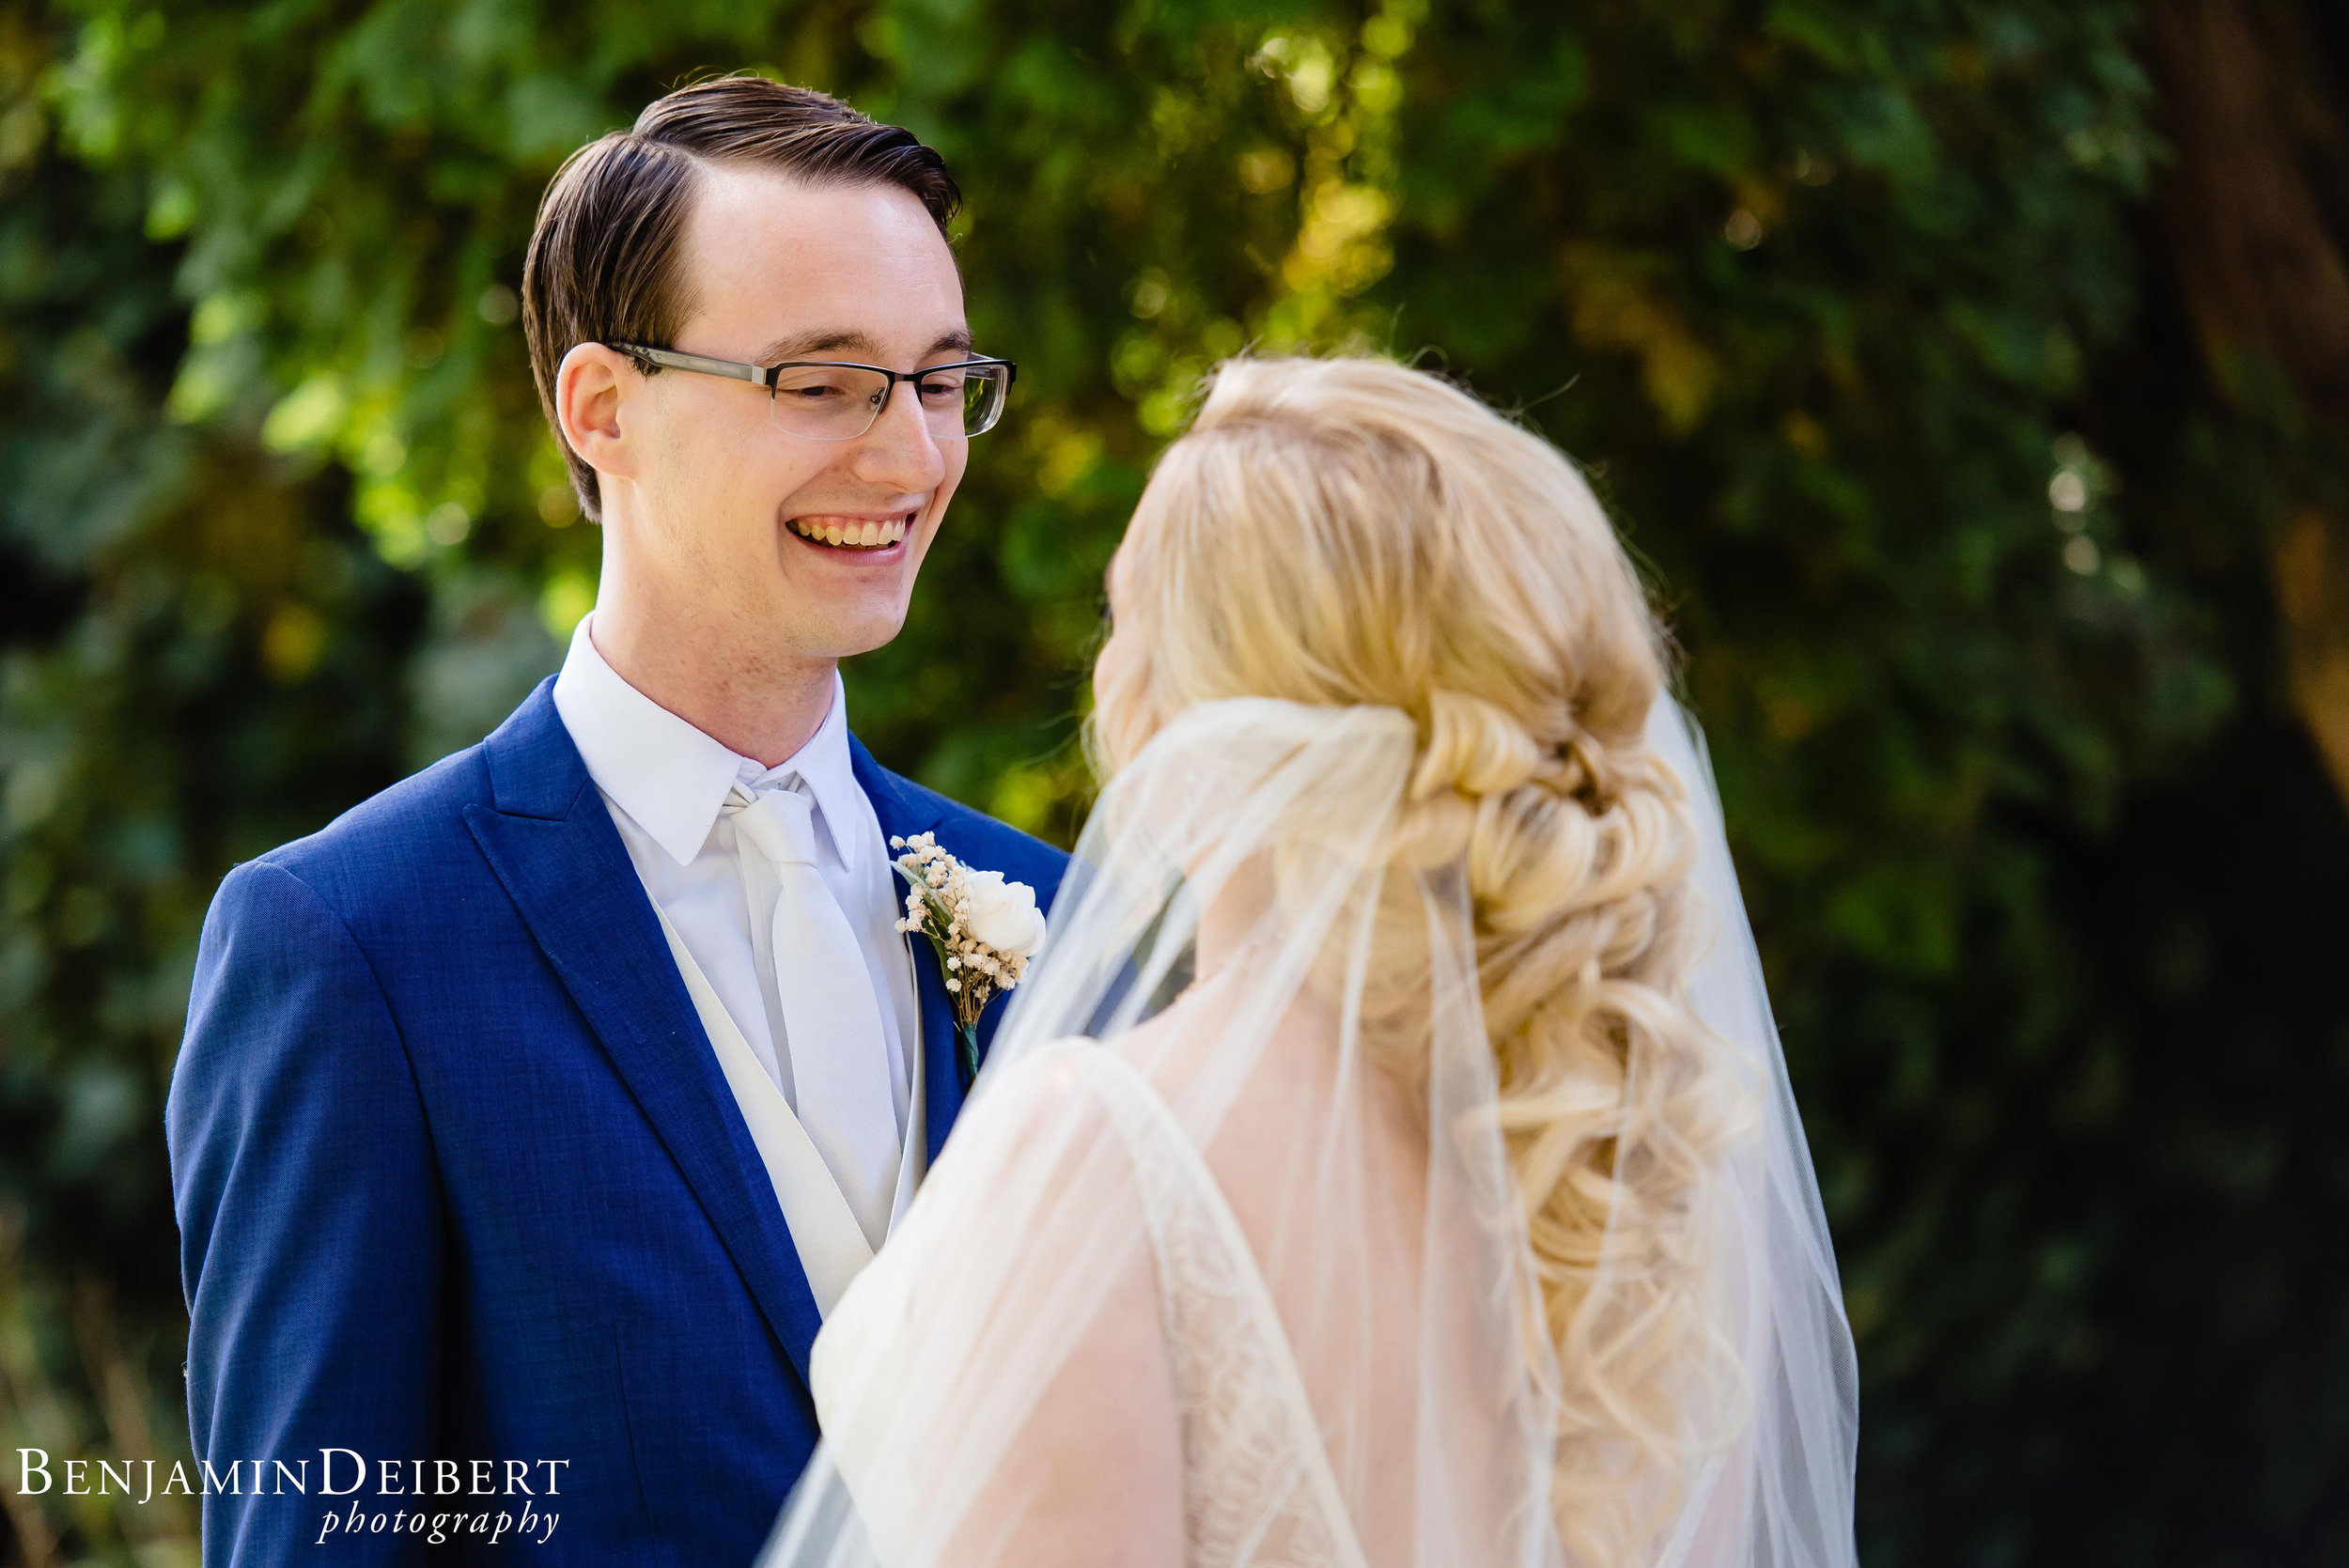 AshleyandDerrick_RadnorValleyCountryClub_Wedding-25.jpg